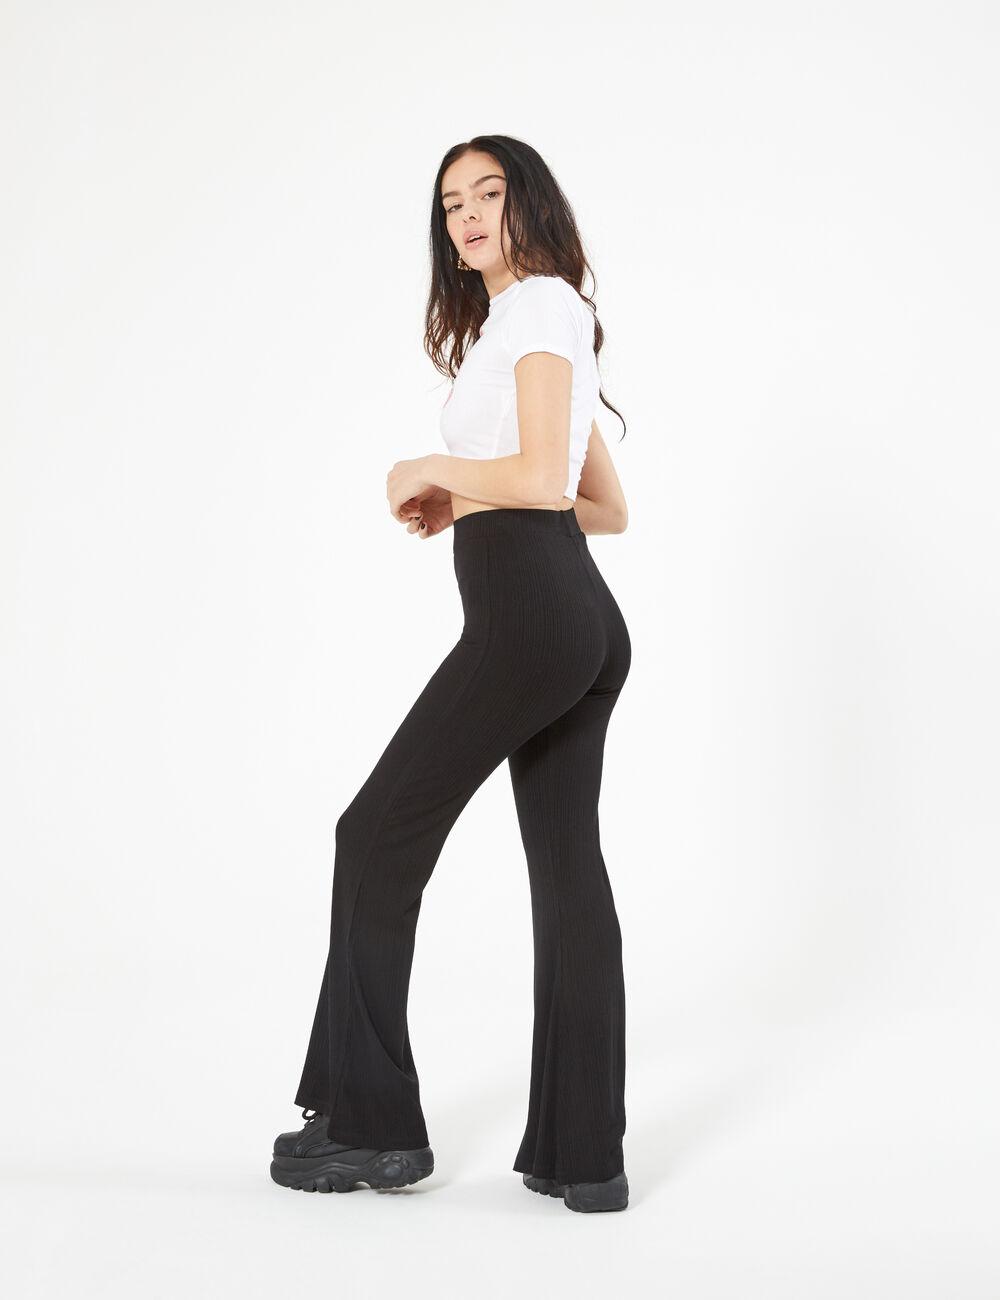 Femme Pantalon Femme Jennyfer Jennyfer Pantalon Femme Pantalon WHE9DI2